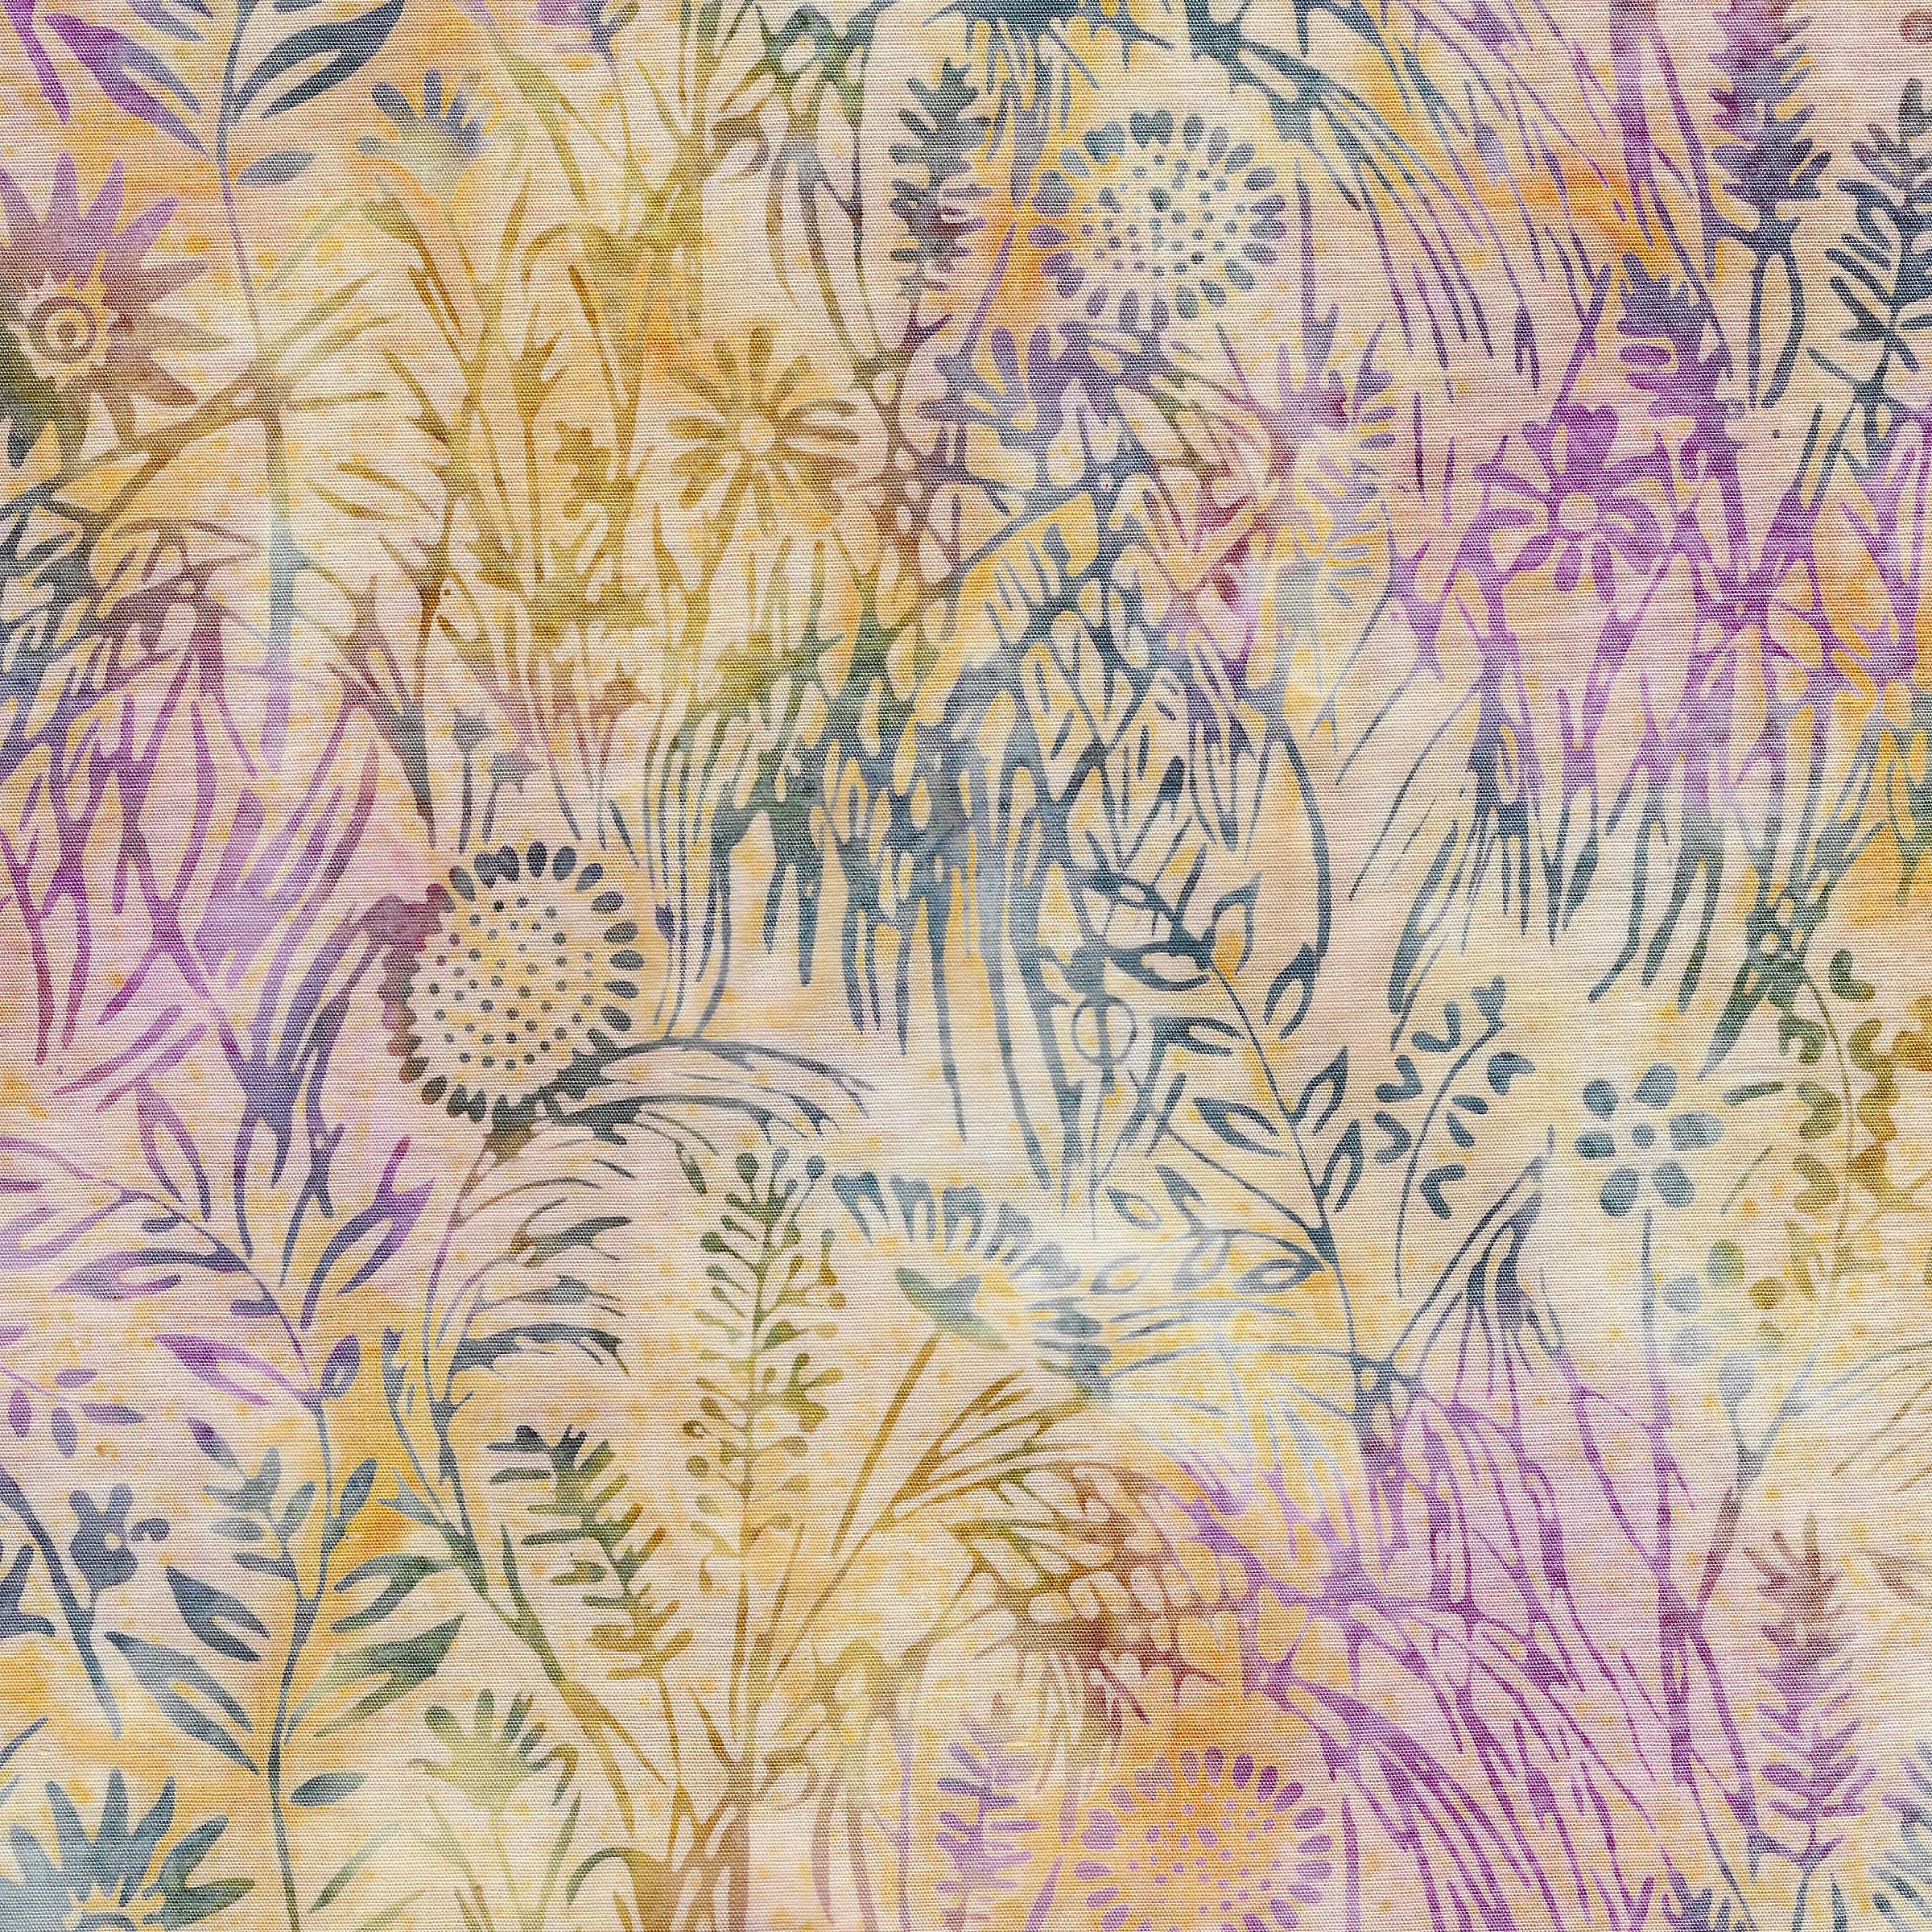 111931825 Island Batik Wildflowers-Peony 111931825